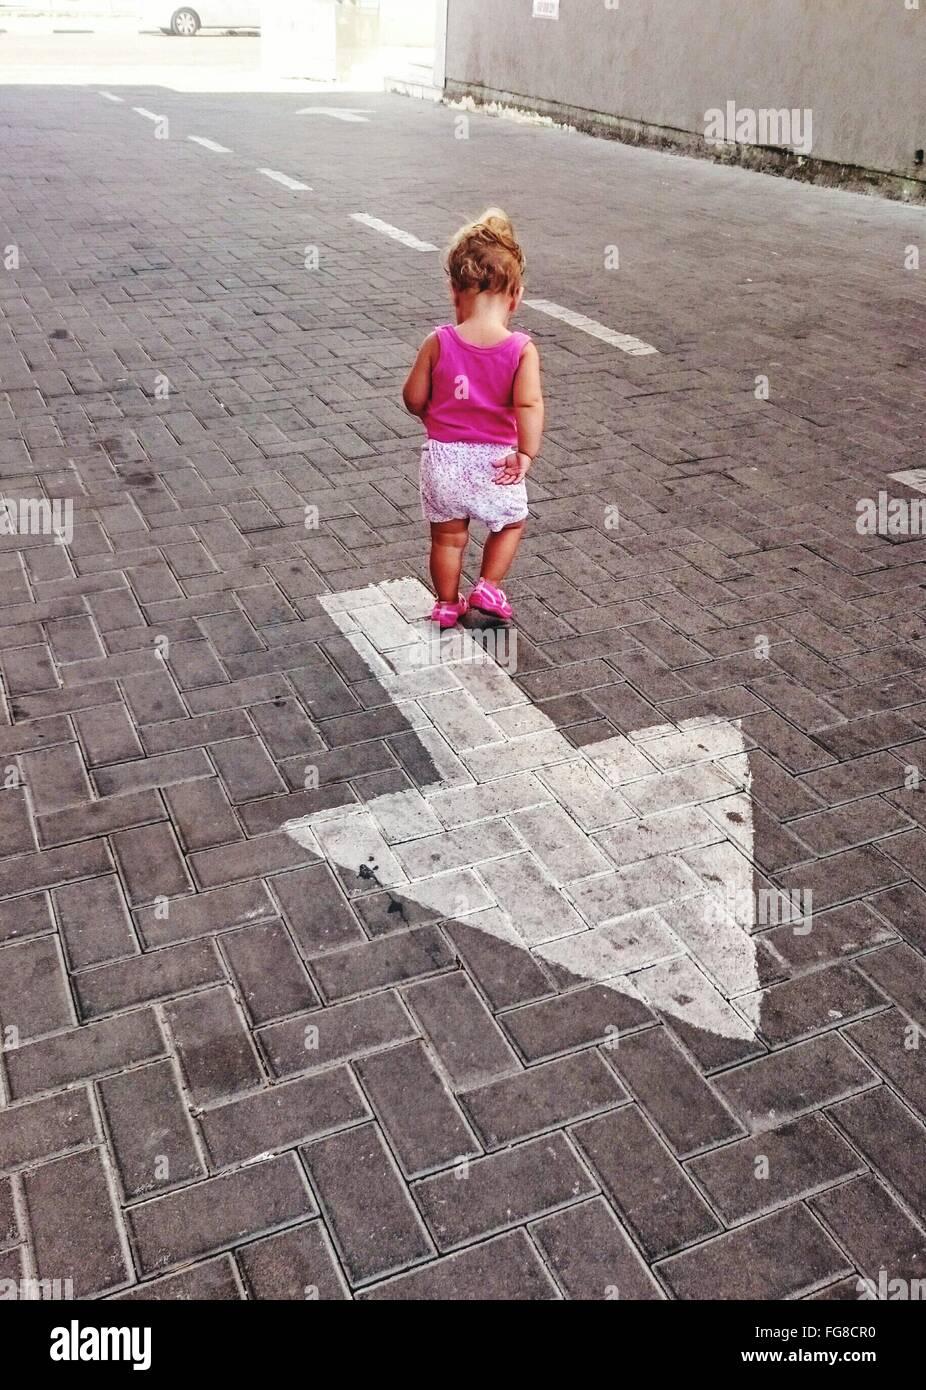 Rear View Of Girl Walking Over Arrow Symbol On Cobblestone Street - Stock Image